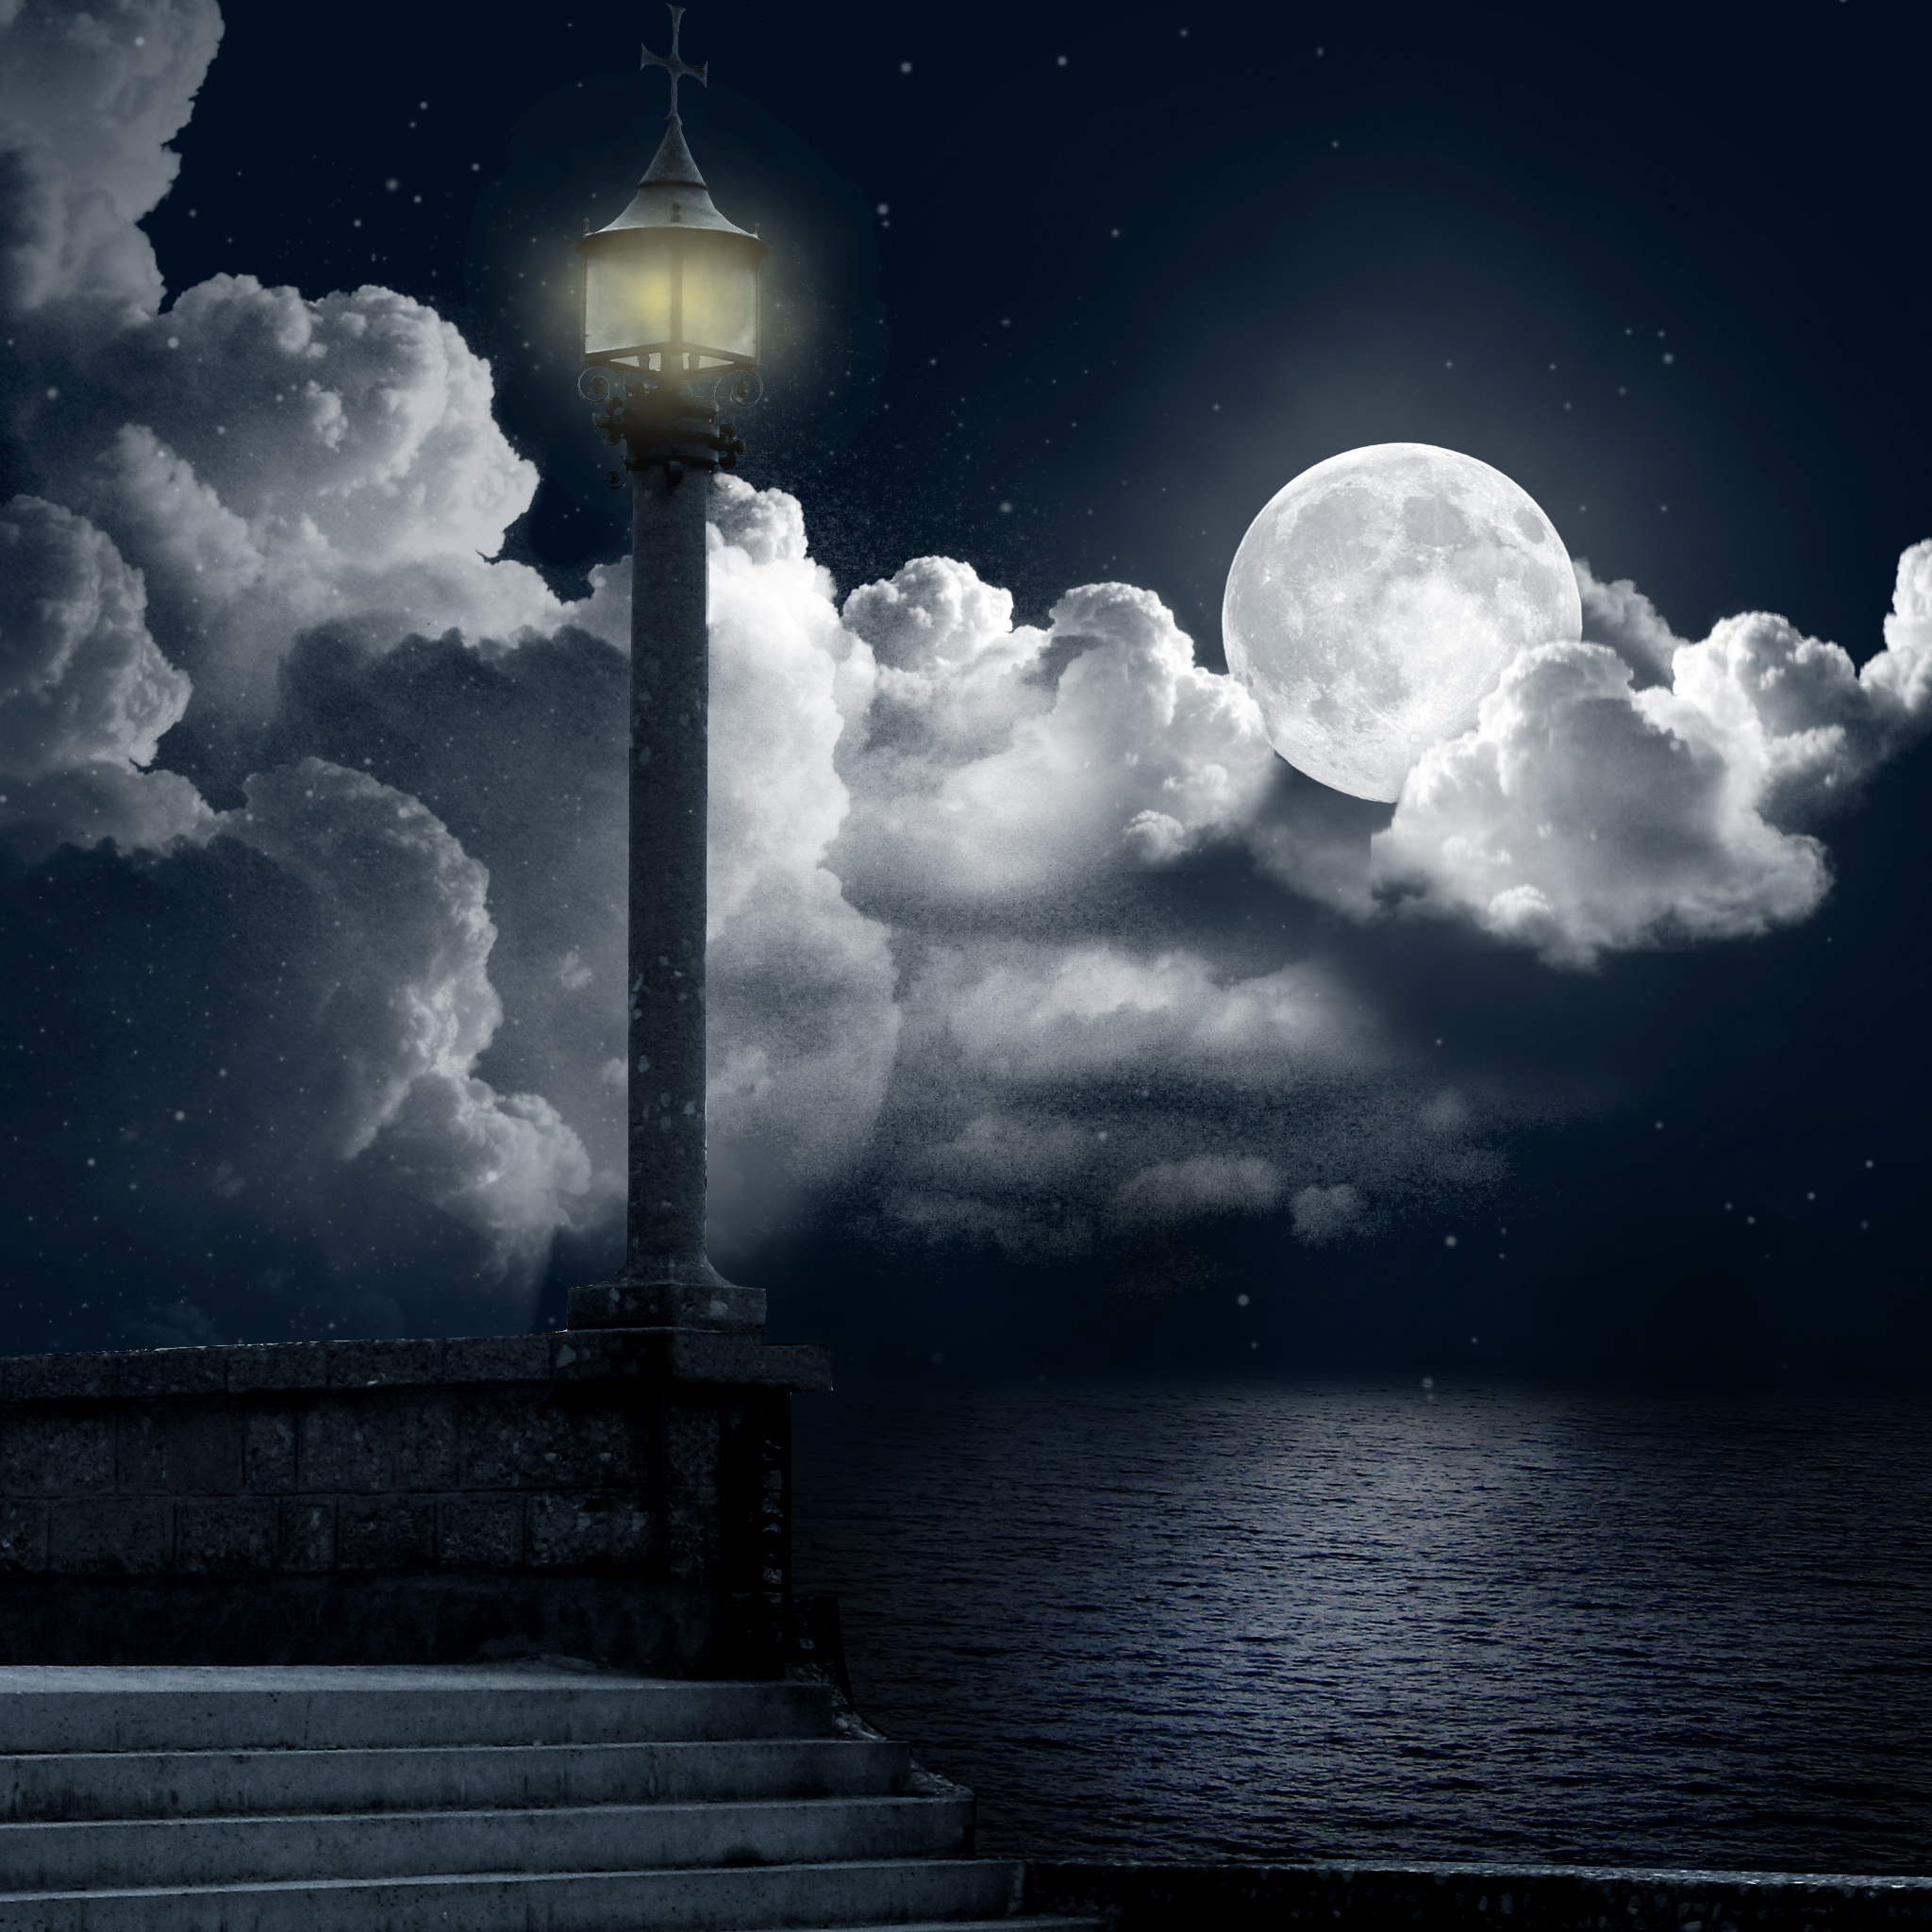 Night Sky 3Wallpapers iPad Retina Night Sky   iPad Retina